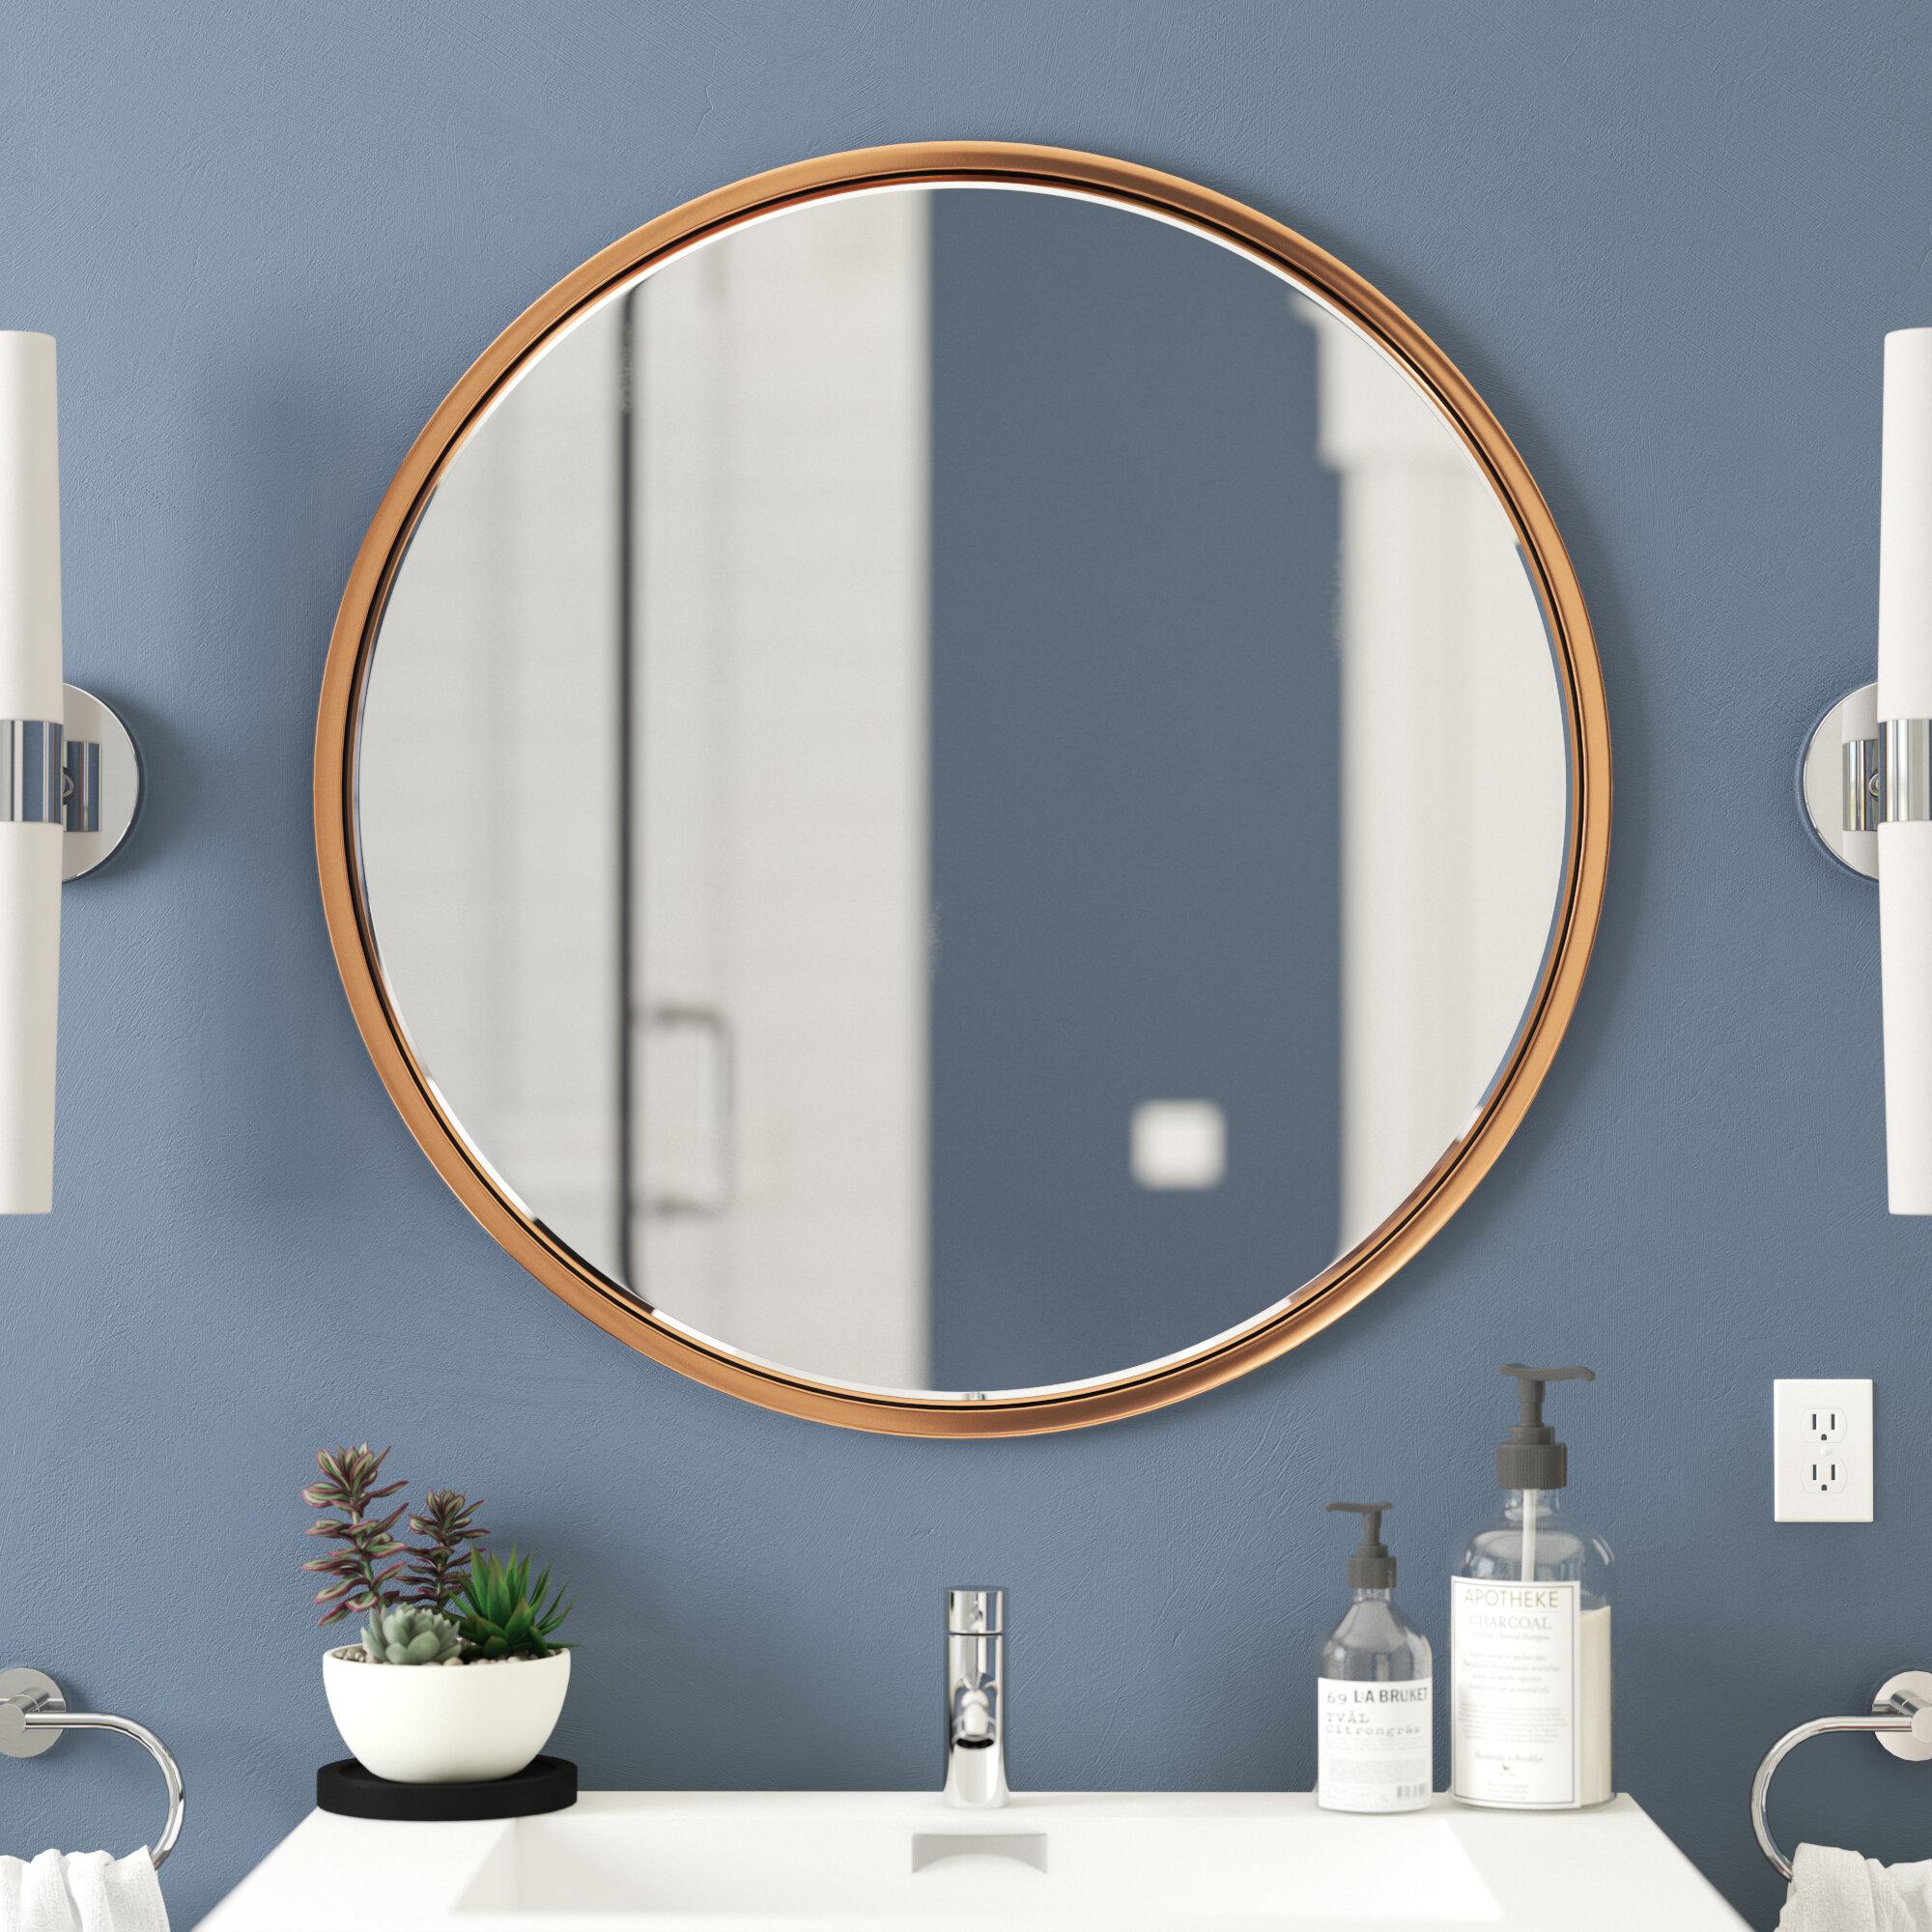 Oval Bathroom Wall Mirror Modern Stylish Gold Black Metal Frame Wall Hanging Metal Circle Bathroom Mirrors Vanity Mirrors